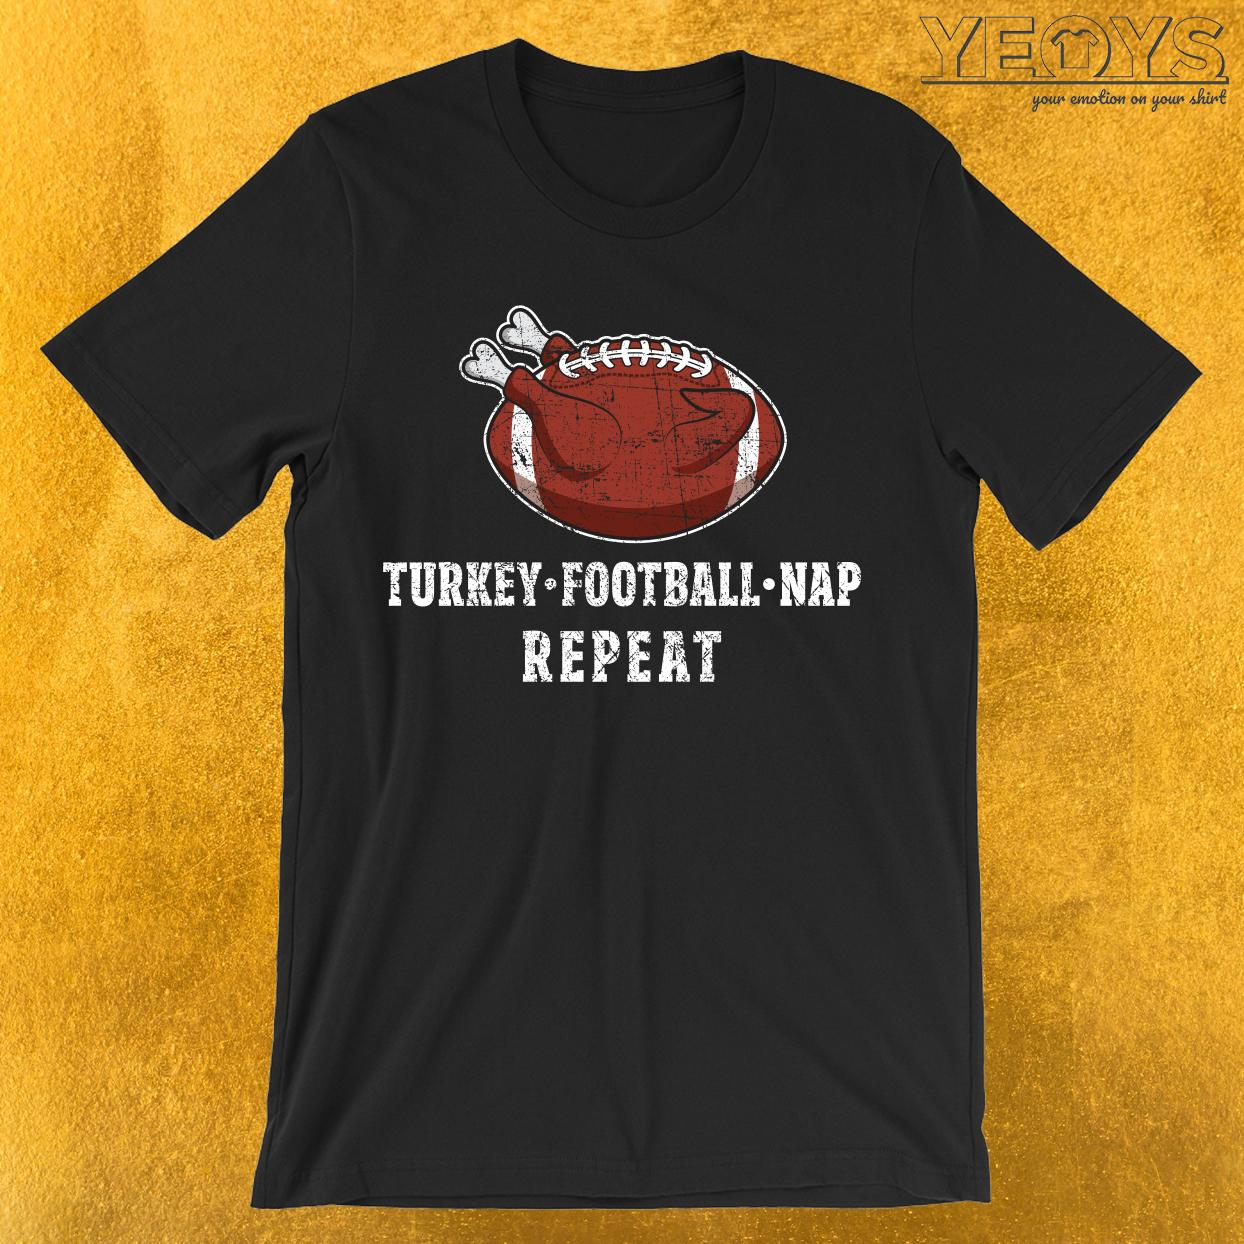 Turkey Football Nap Repeat T-Shirt